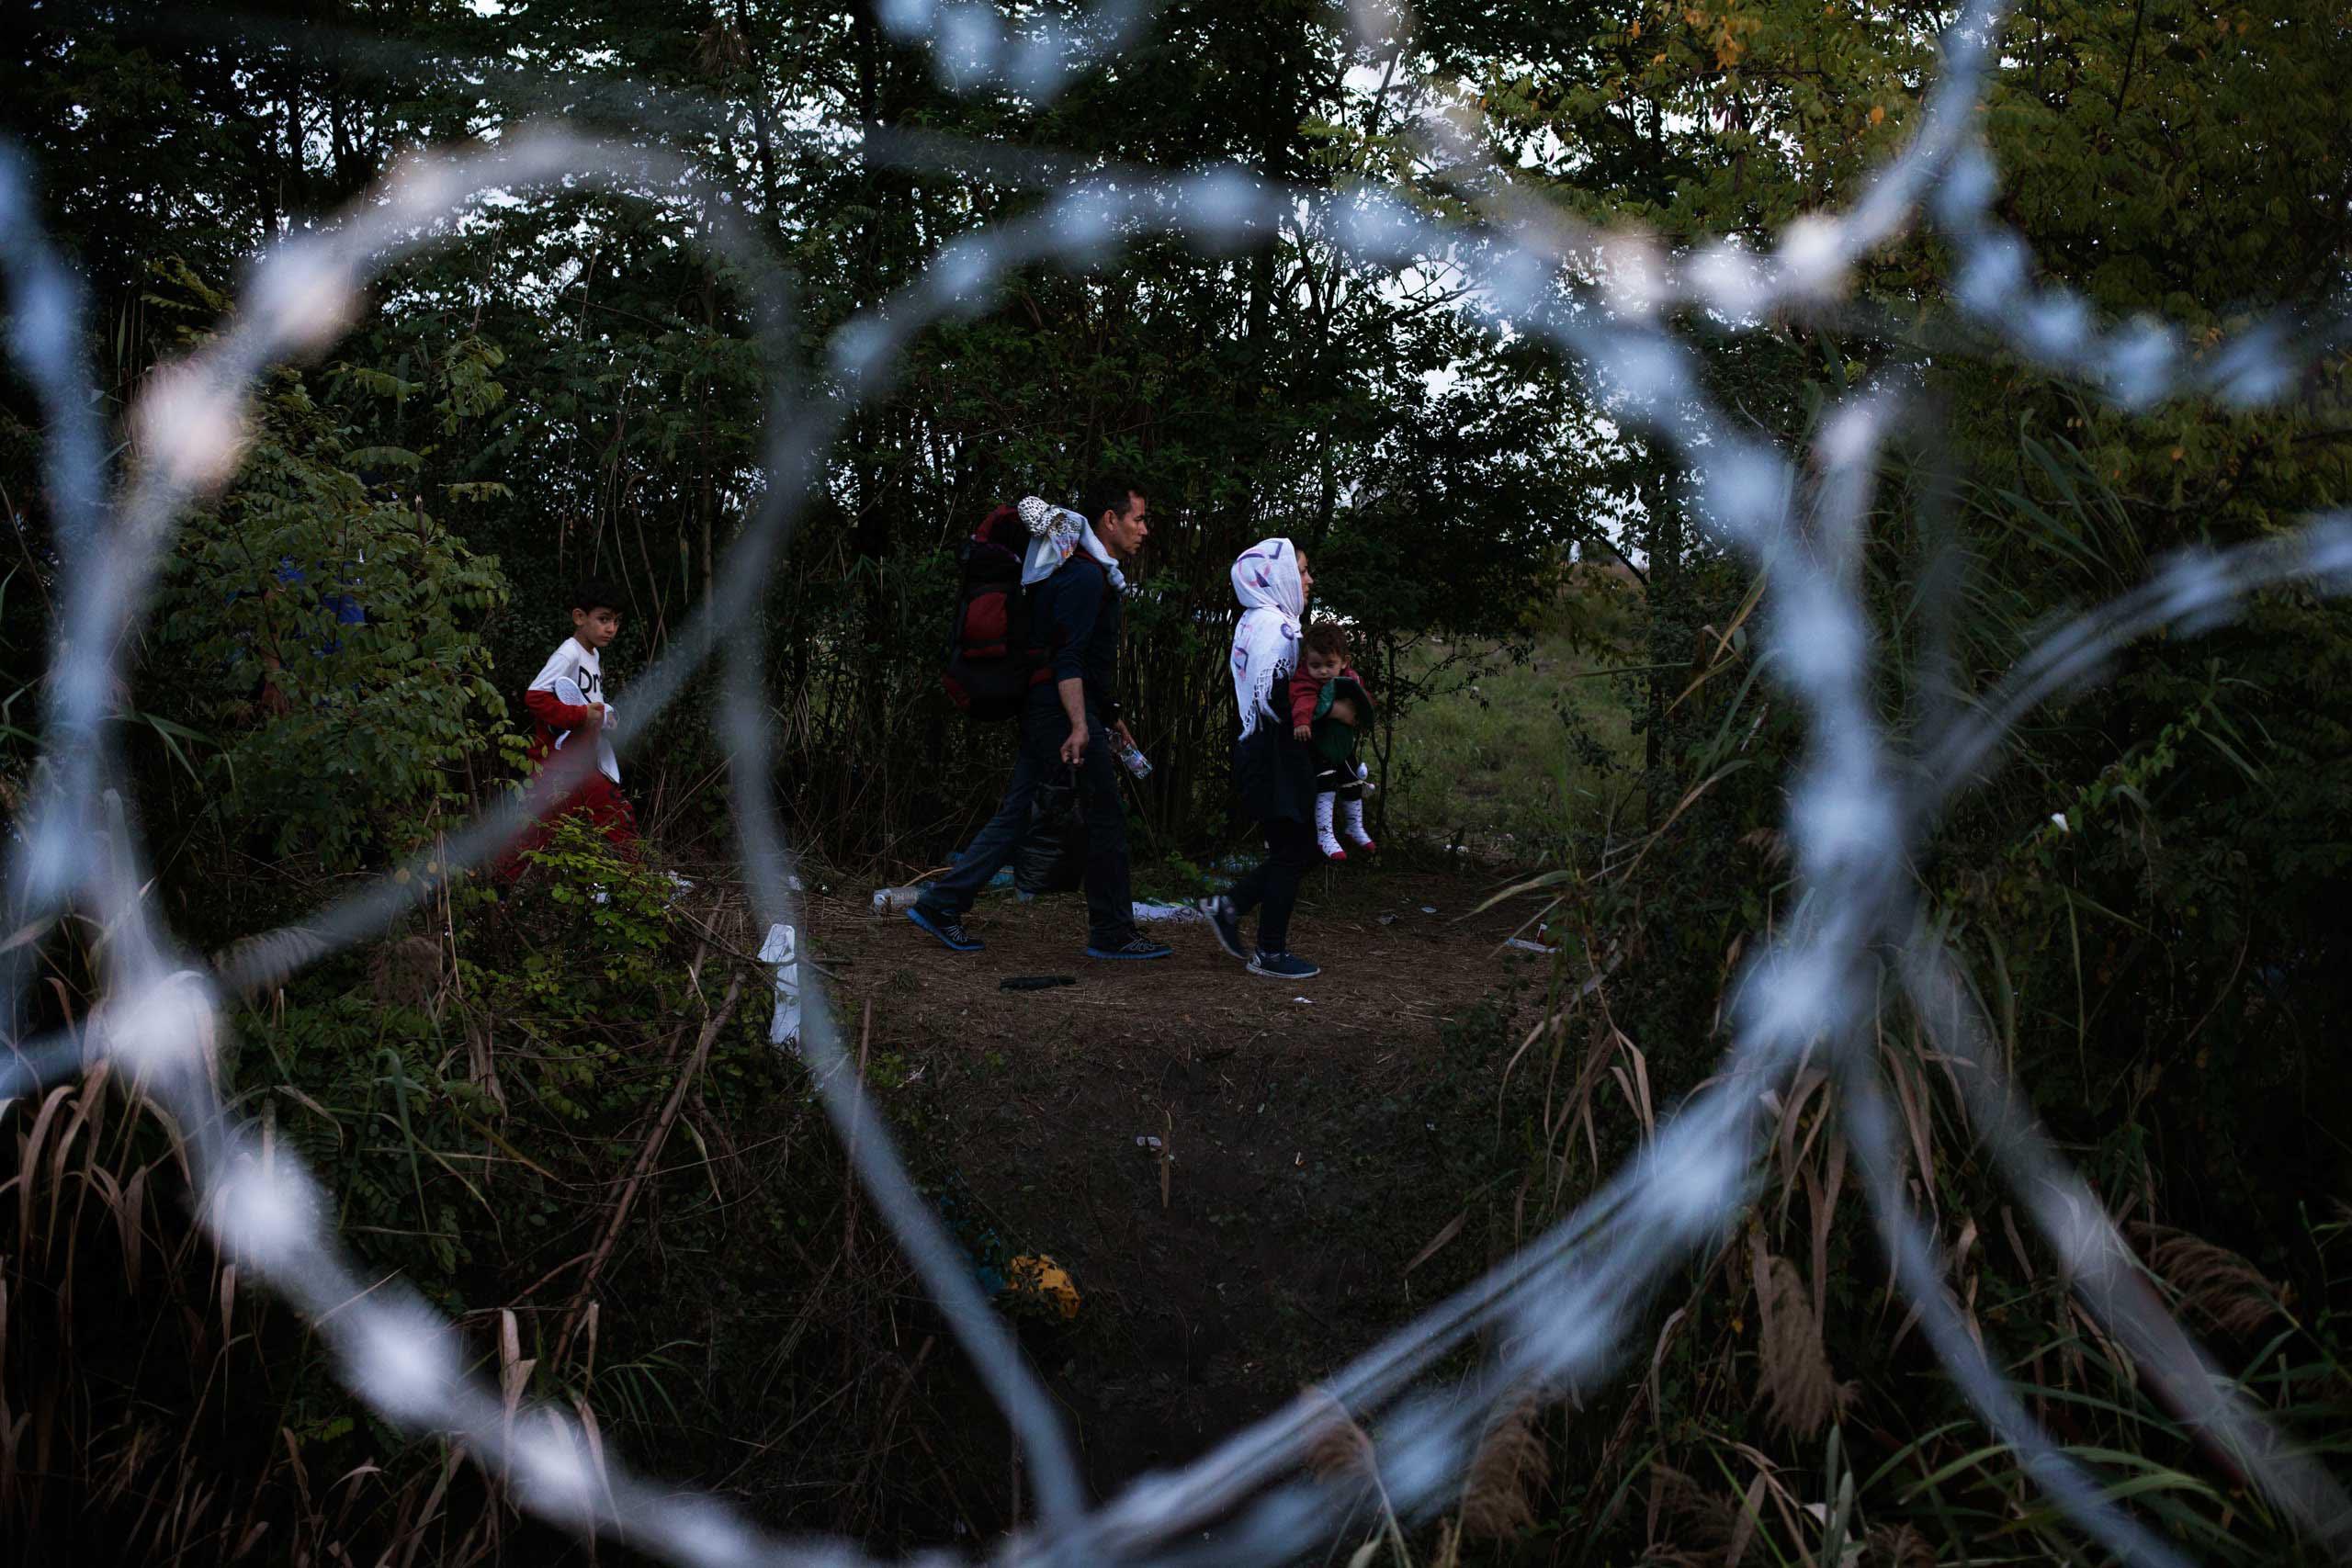 Le Monde: Europe's Locked DoorsA family walks near the Serbia-Hungary border, on Sept. 14, 2015.